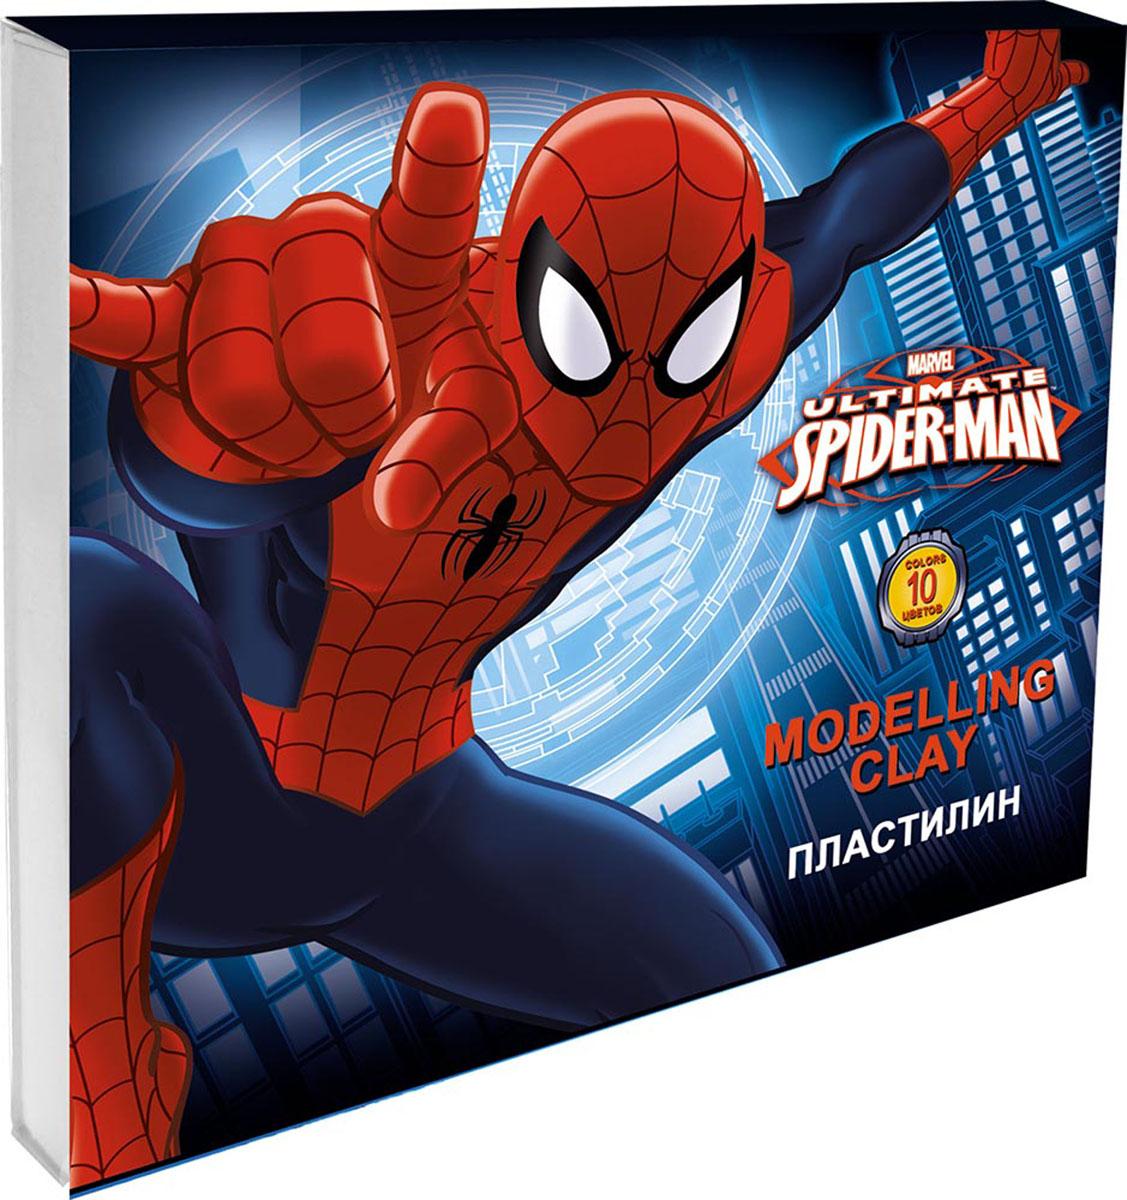 Пластилин Spider-Man, 10 цветов пластилин spider man 10 цв